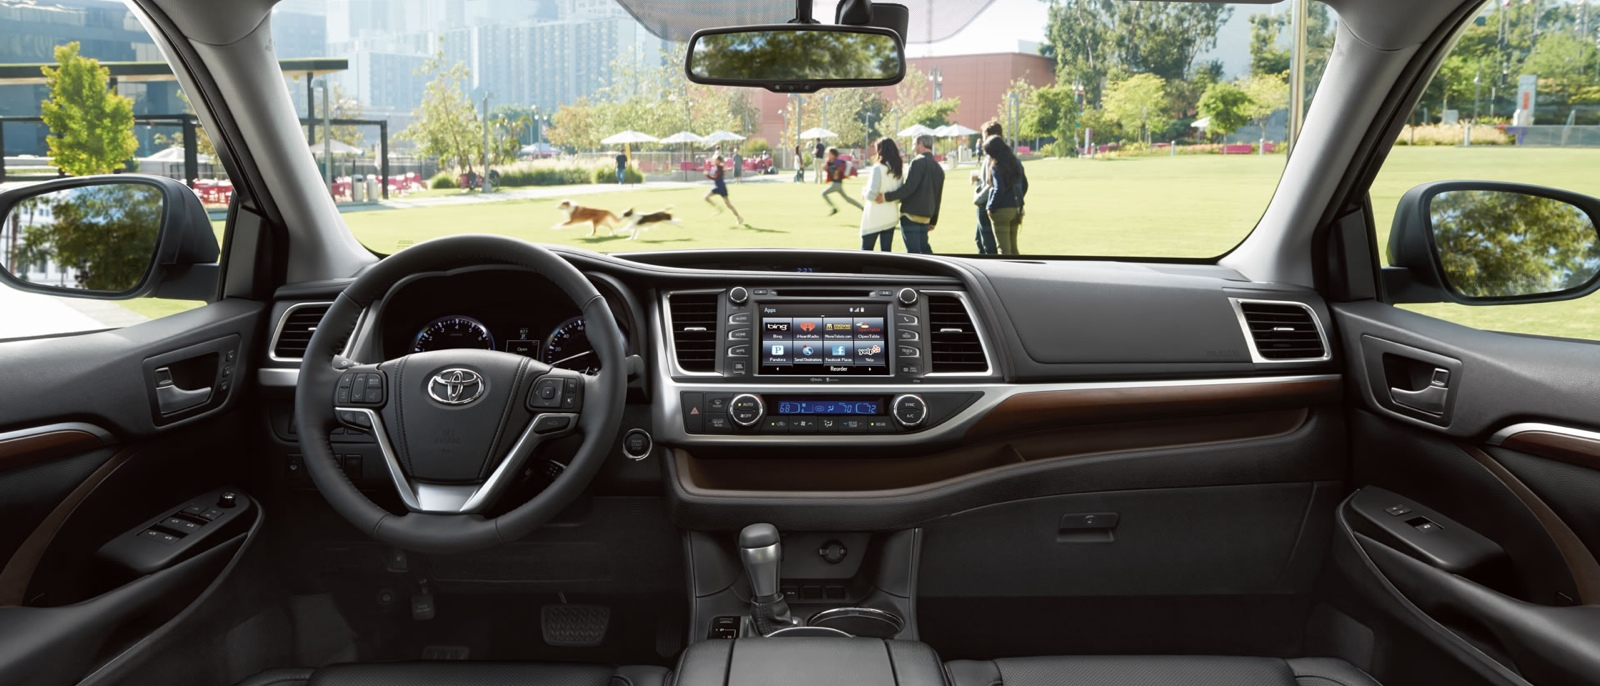 2015 Toyota Highlander Interior